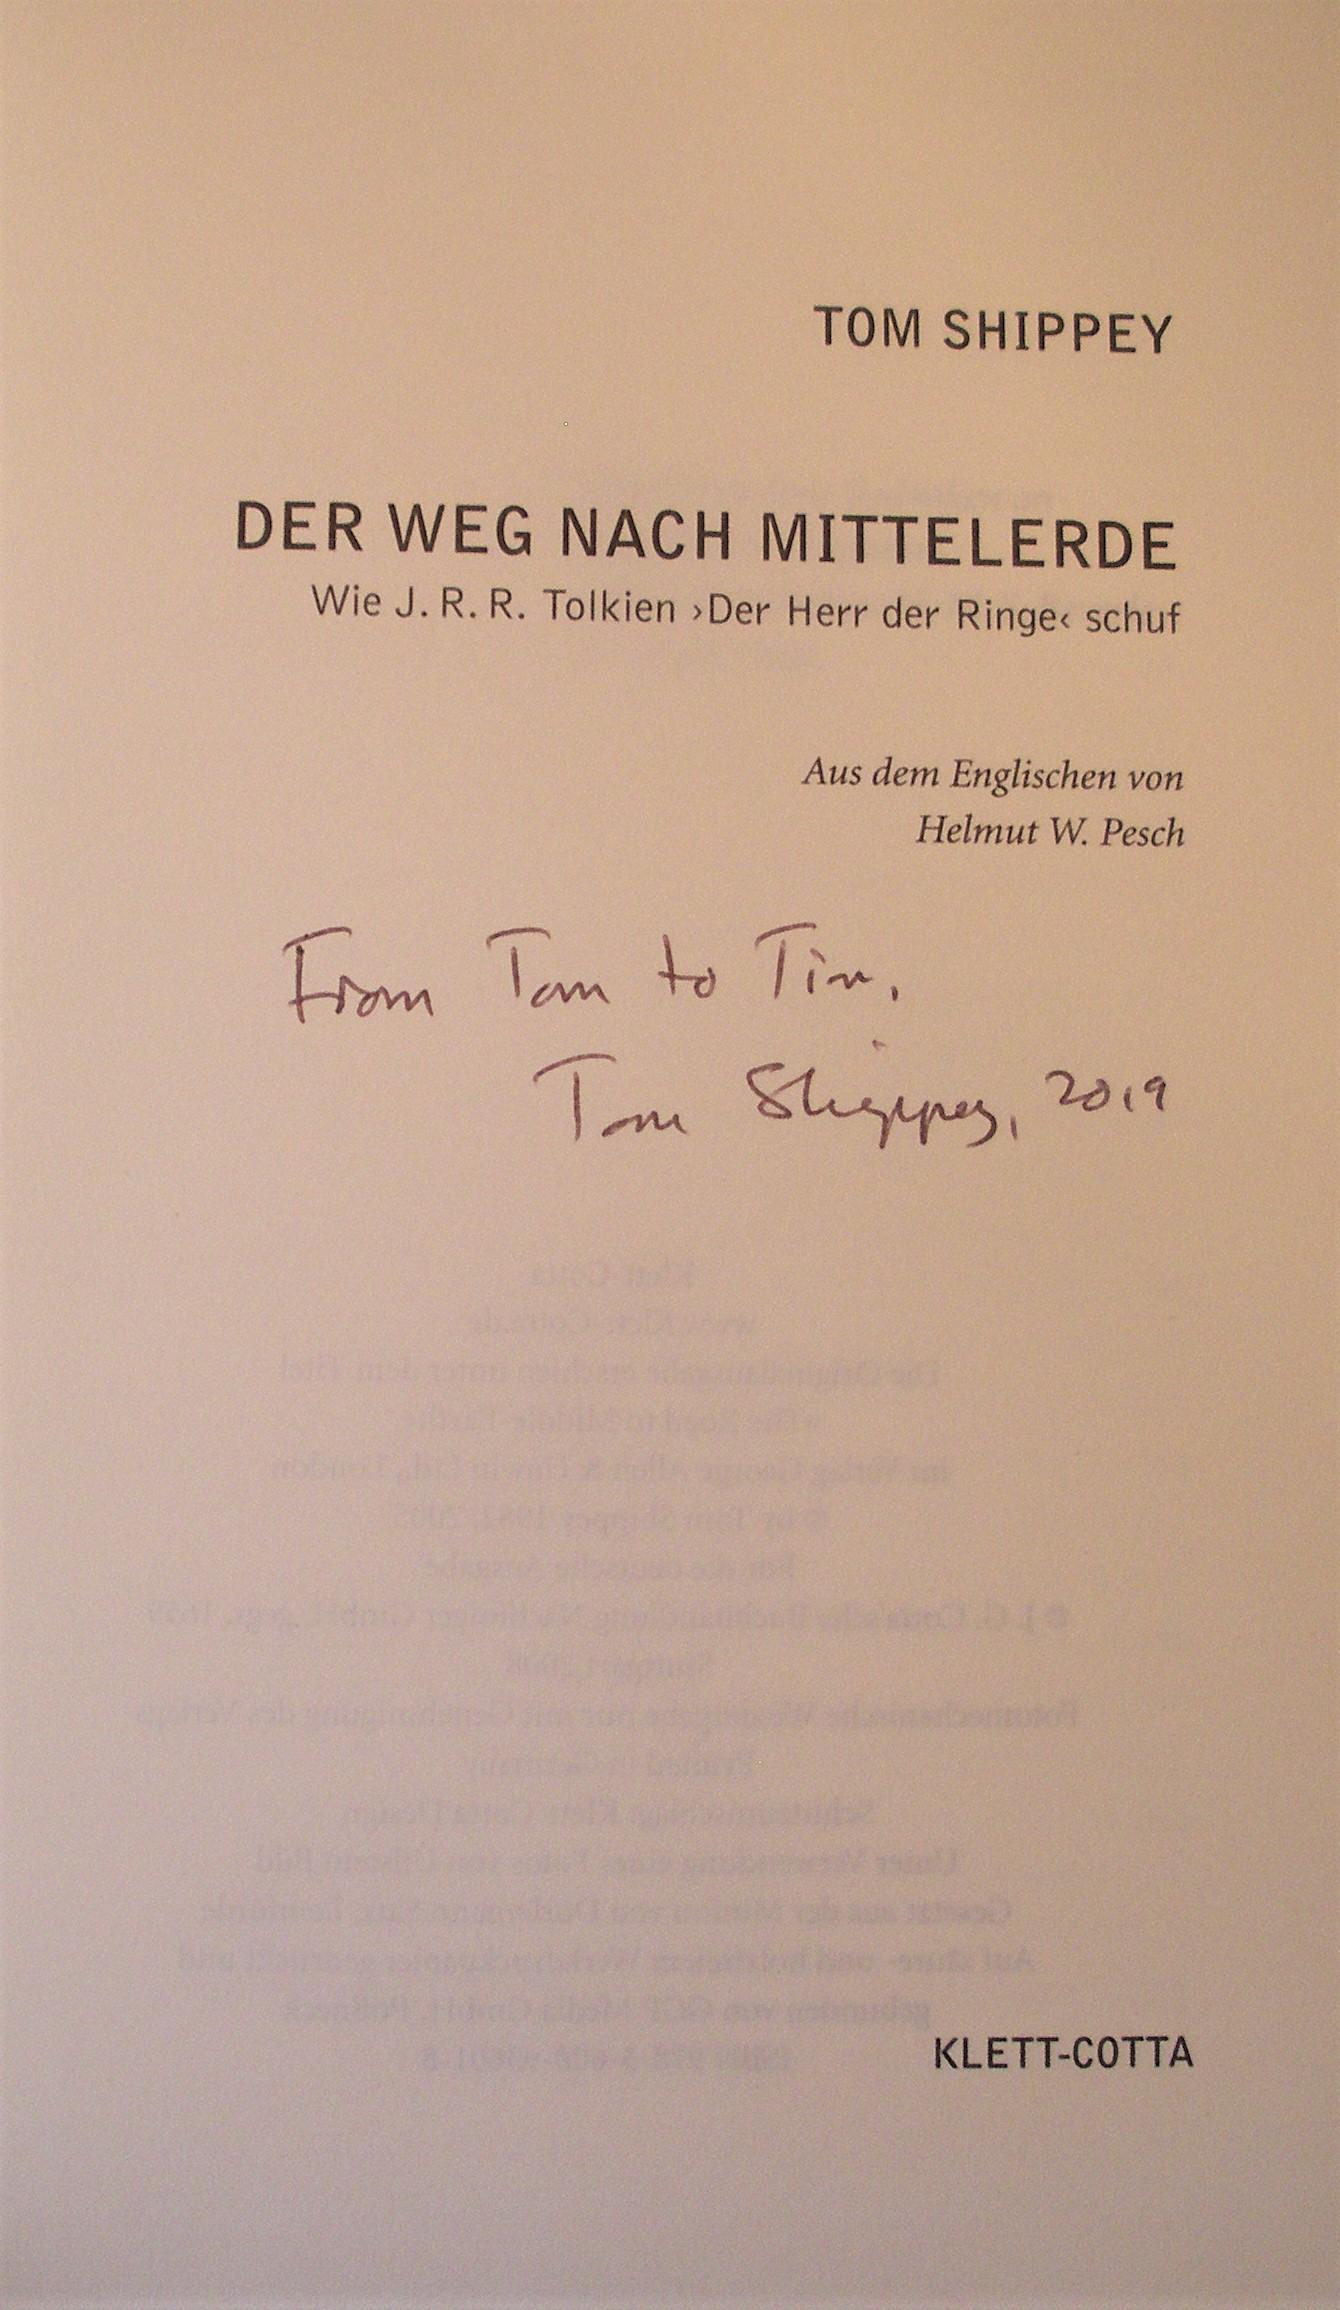 Tom Shippey2